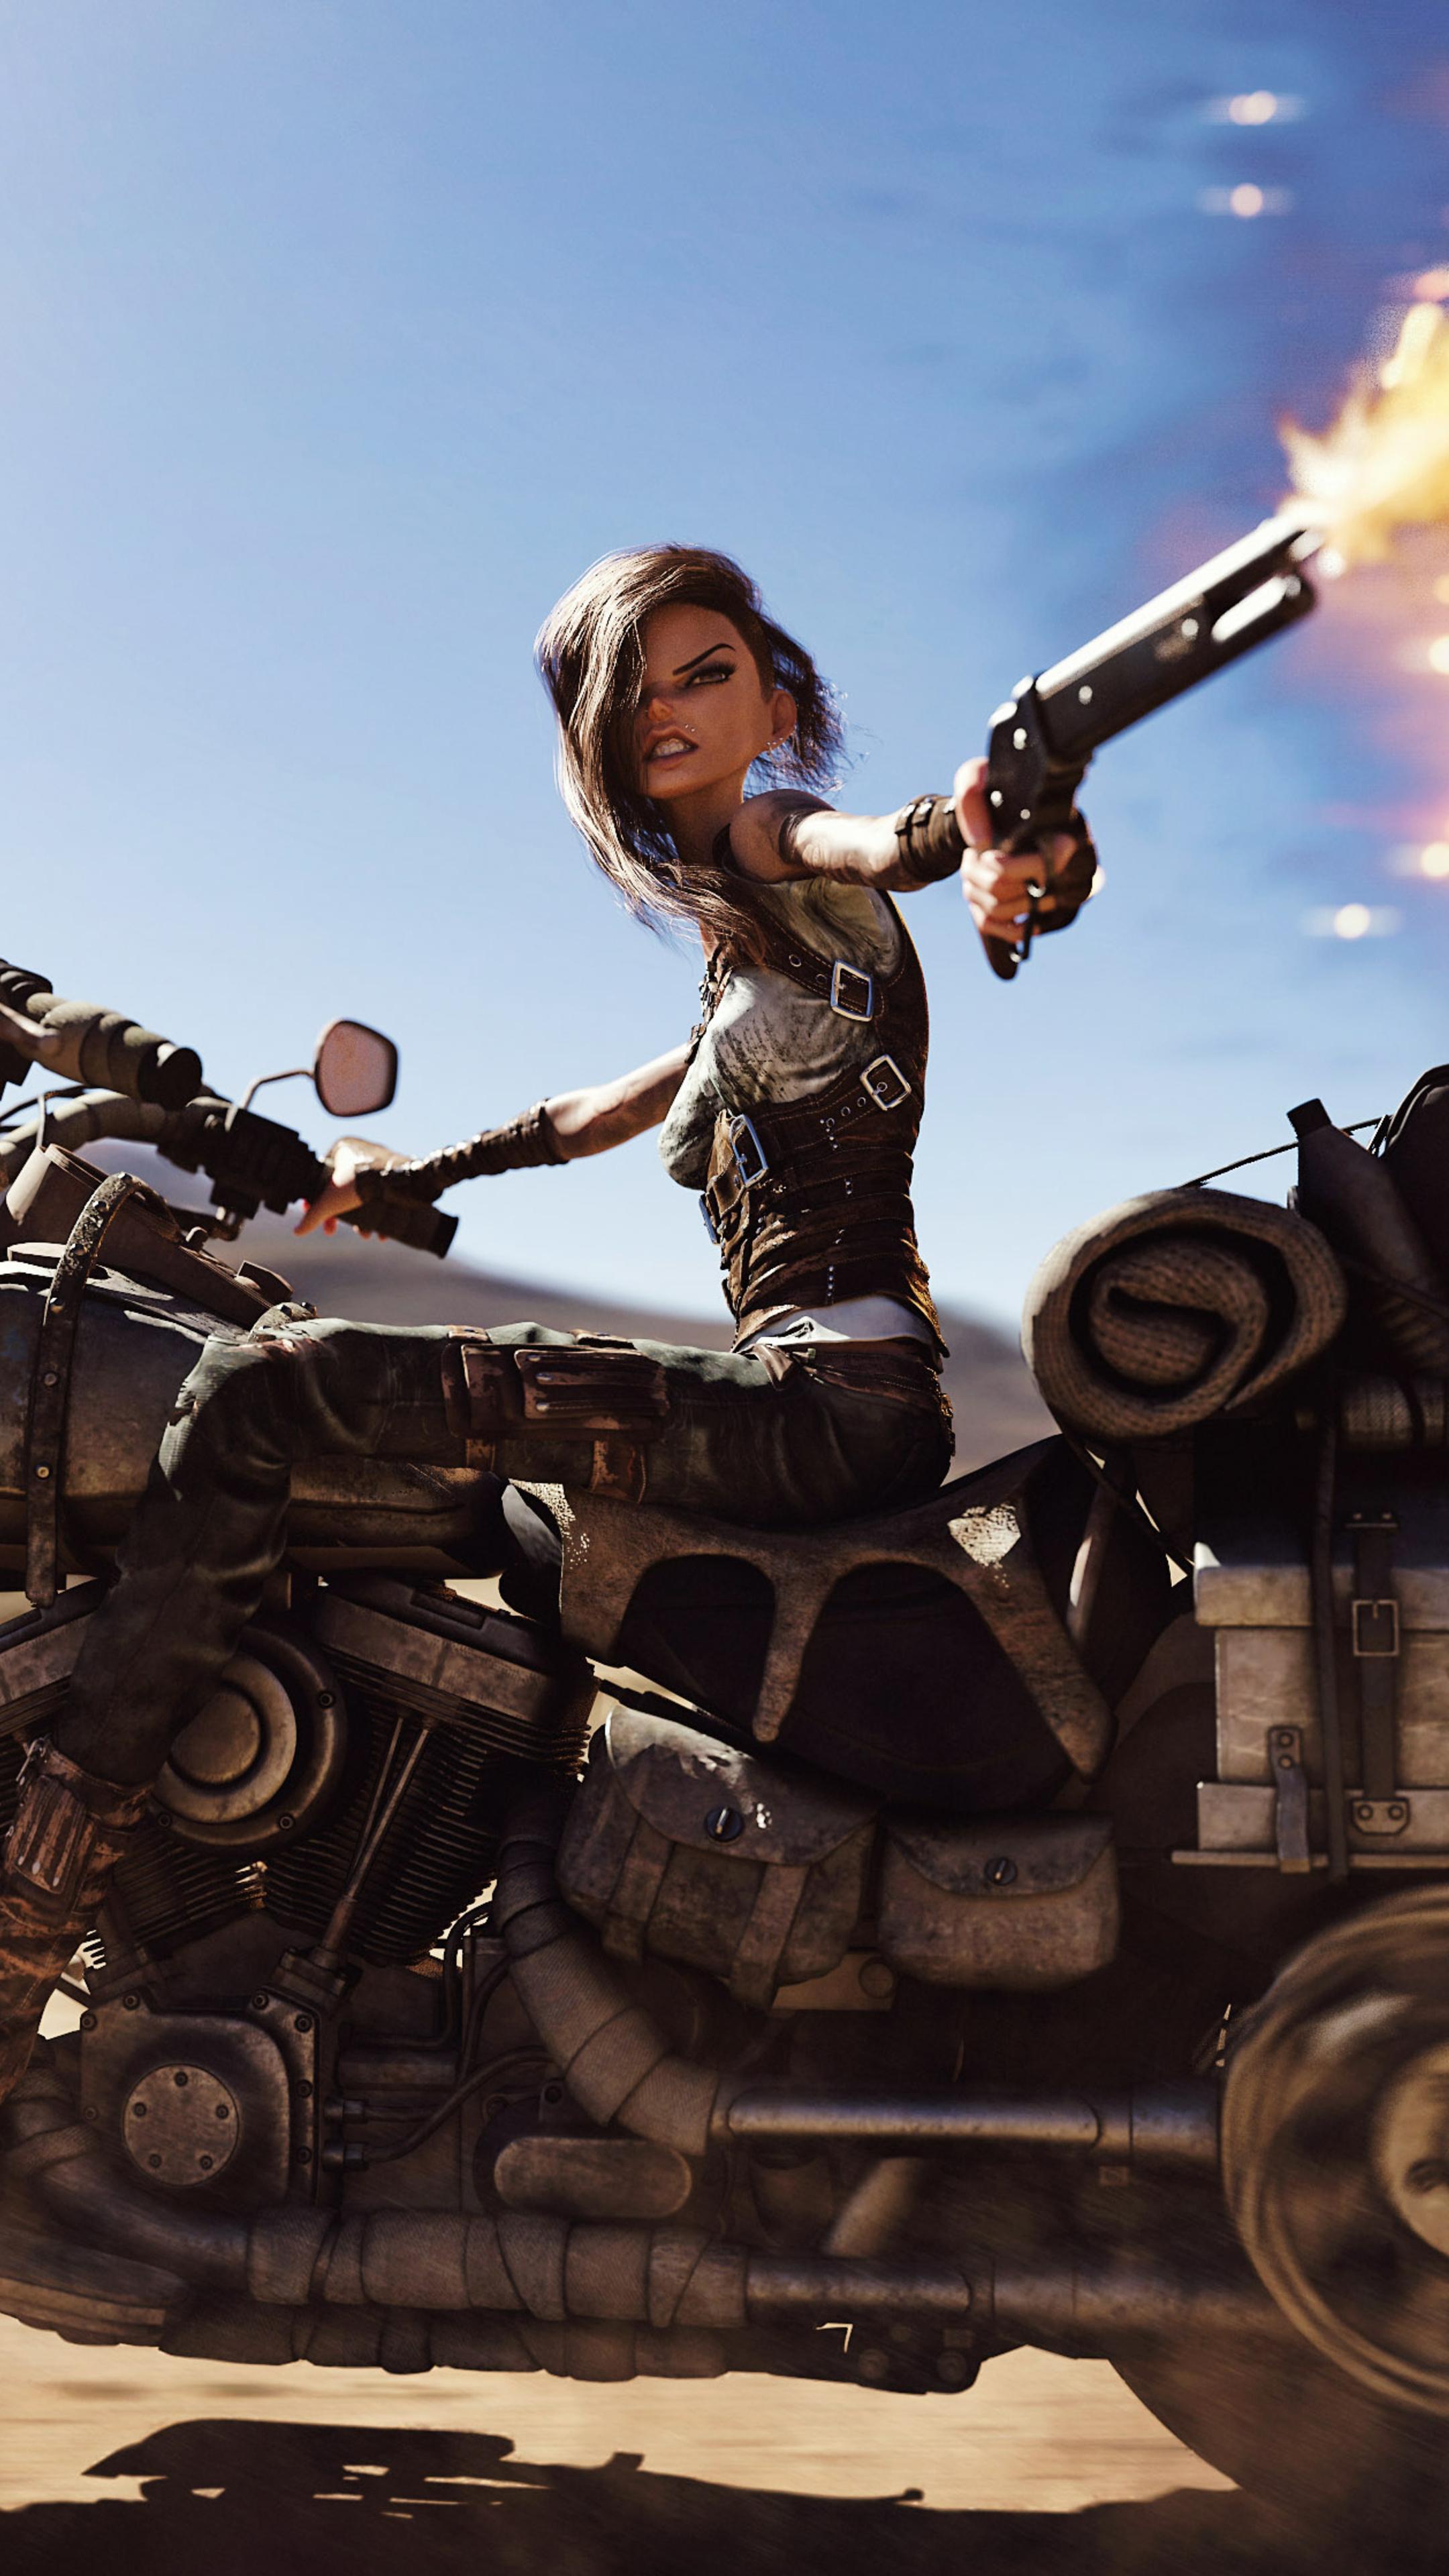 mad-max-biker-anime-girl-96.jpg